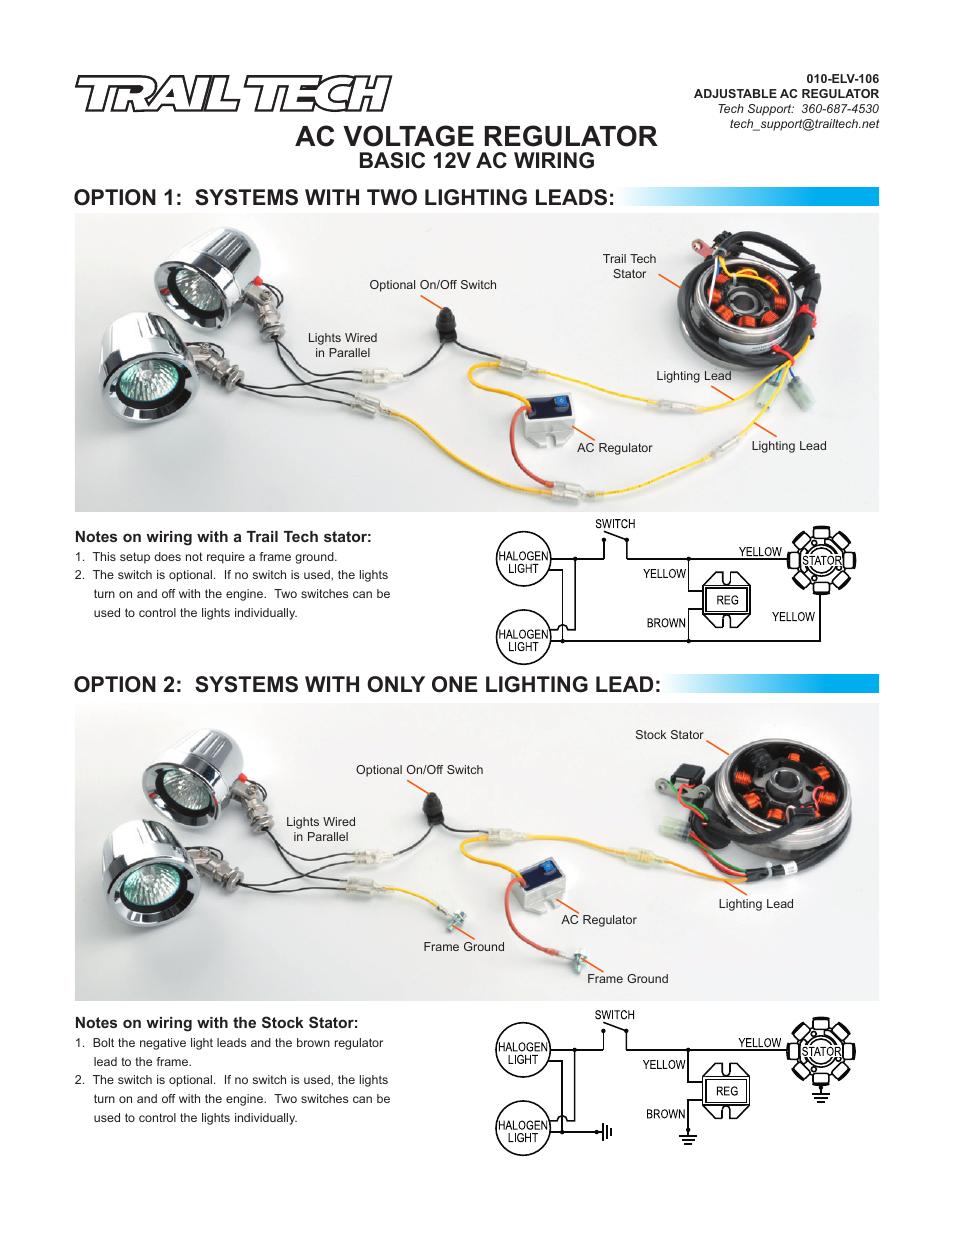 Rectifer Trail Tech Wiring Diagram | Wiring Diagram on